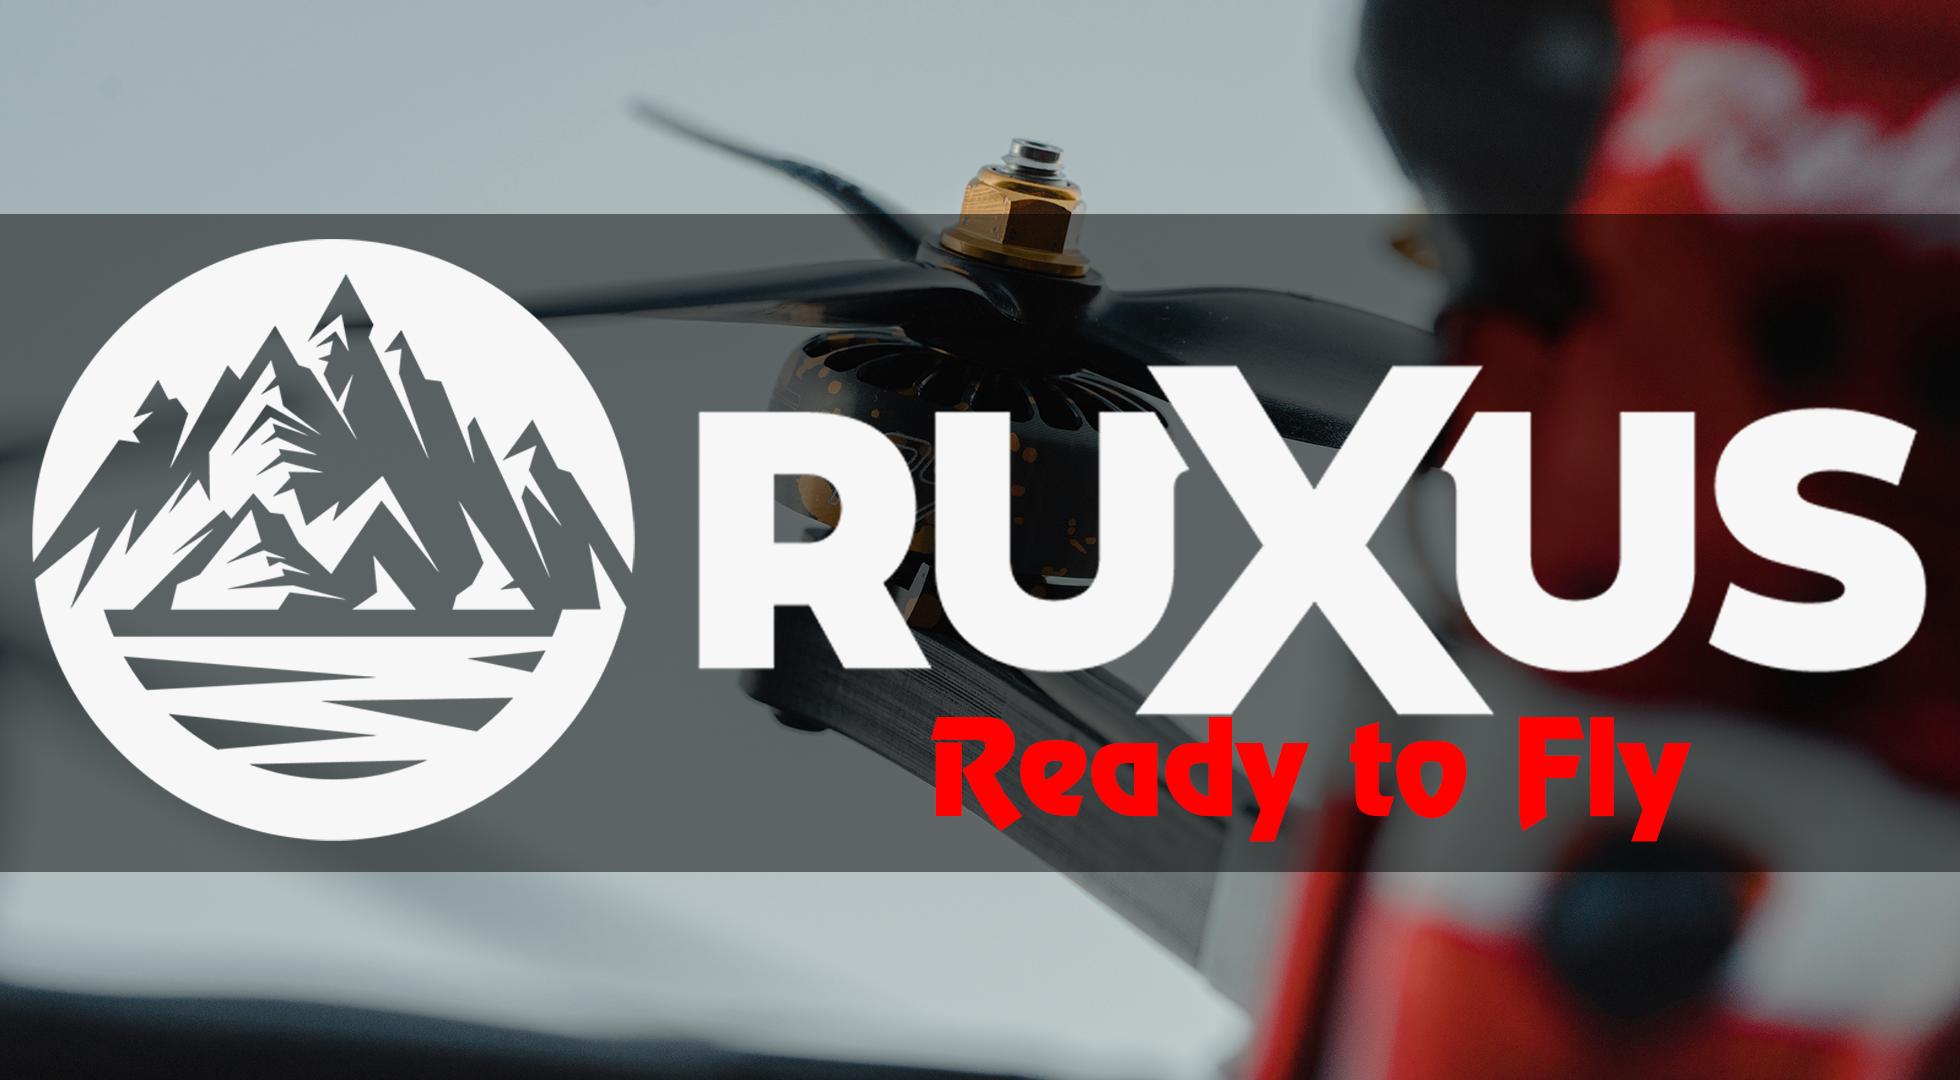 rtf-ruxus-.png